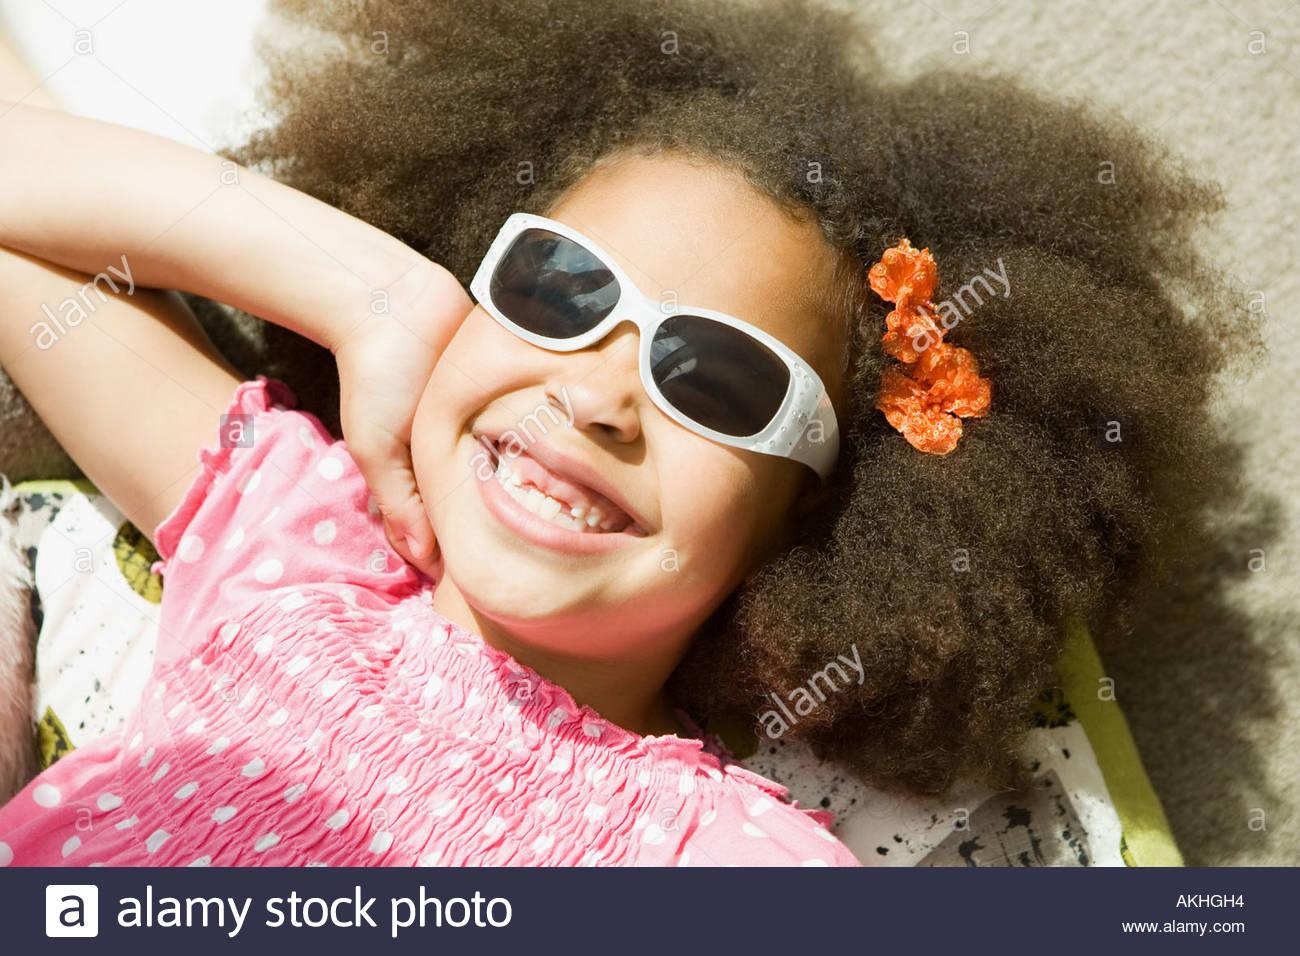 c26ad4580318 Girl wearing sunglasses Stock Photo: 8574227 - Alamy